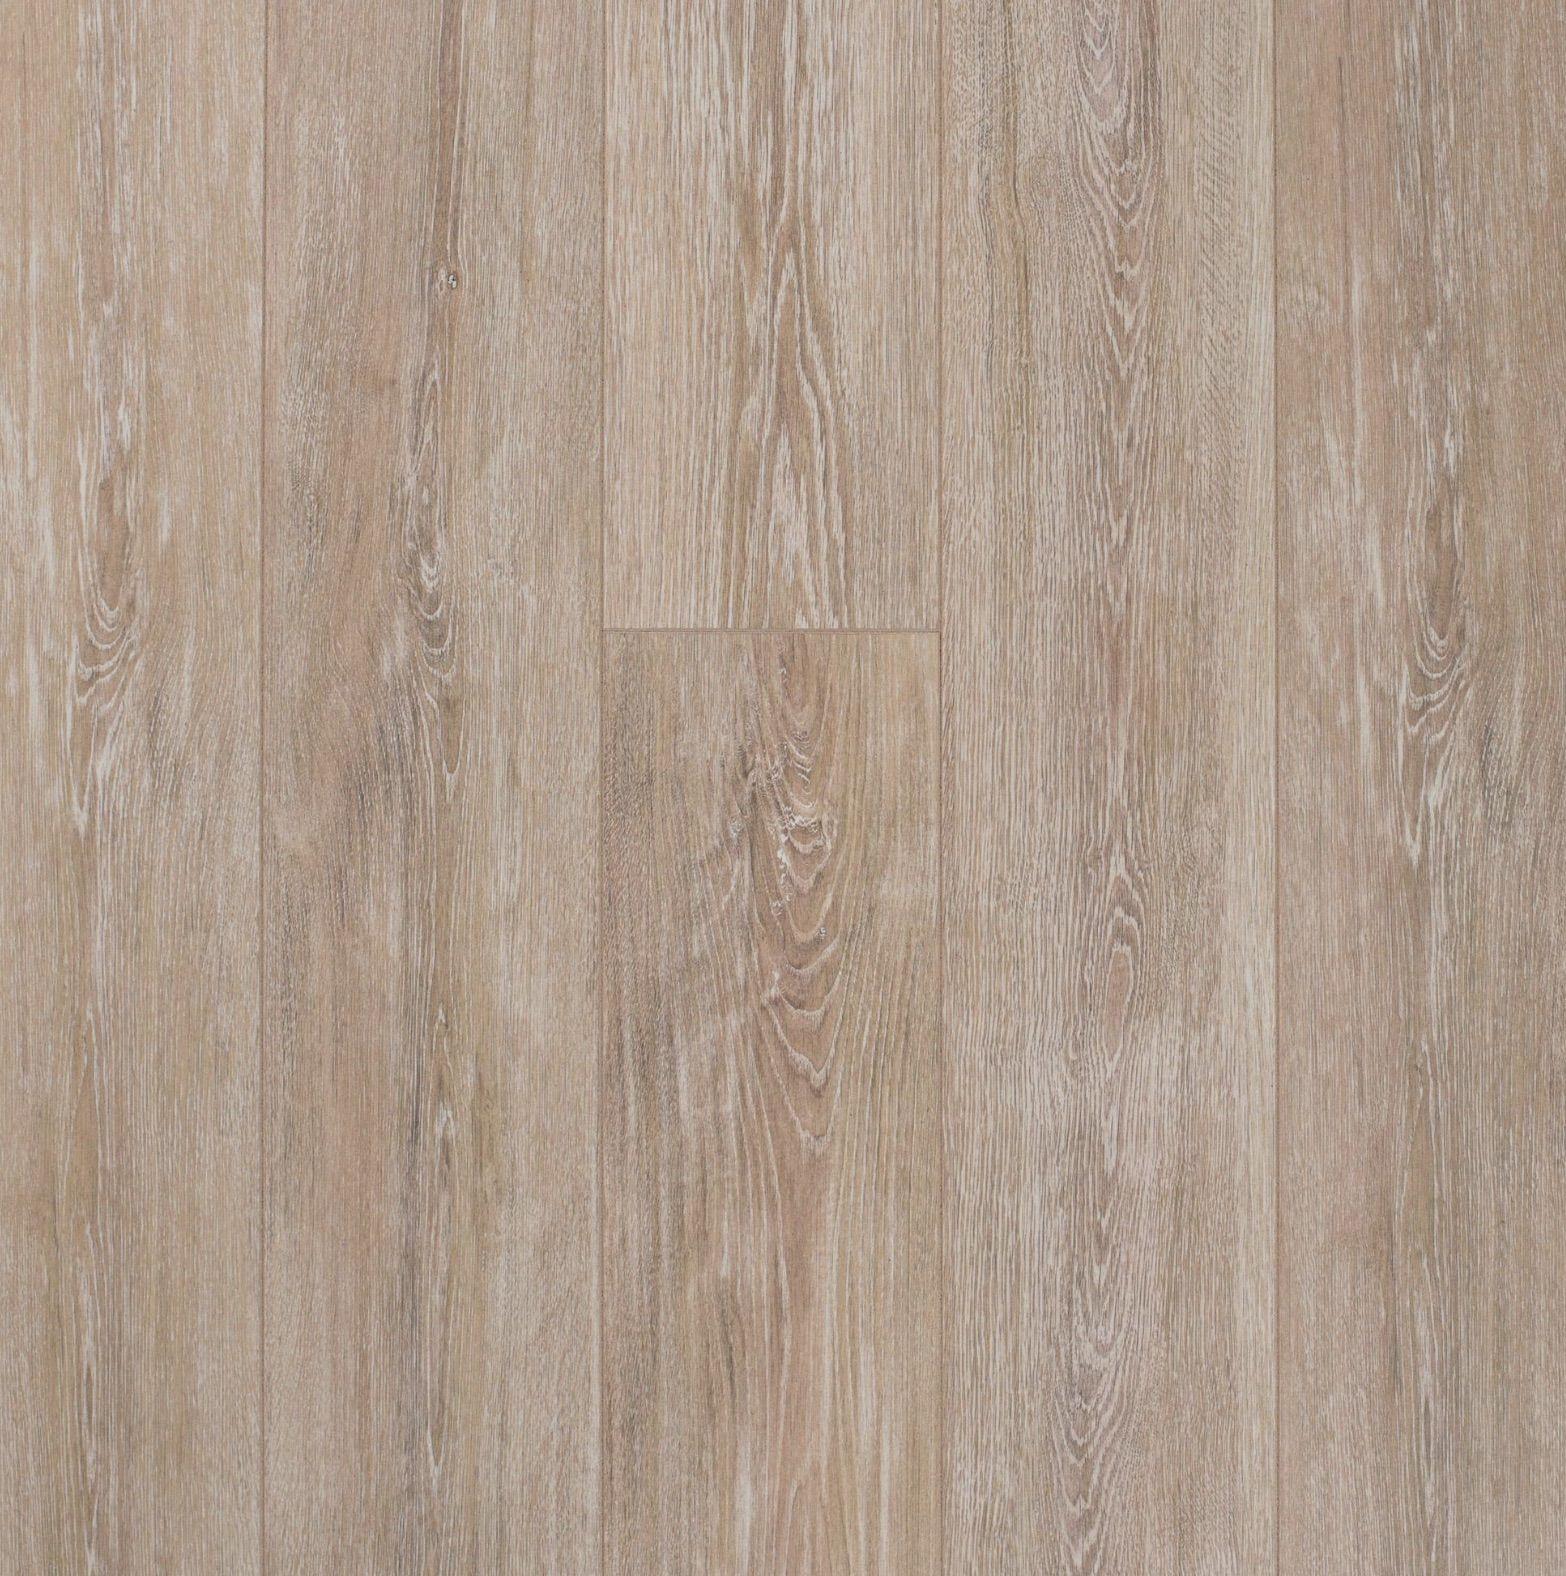 Sunset Oak Smooth Cork Plank Wood Floors Wide Plank Flooring Cork Flooring